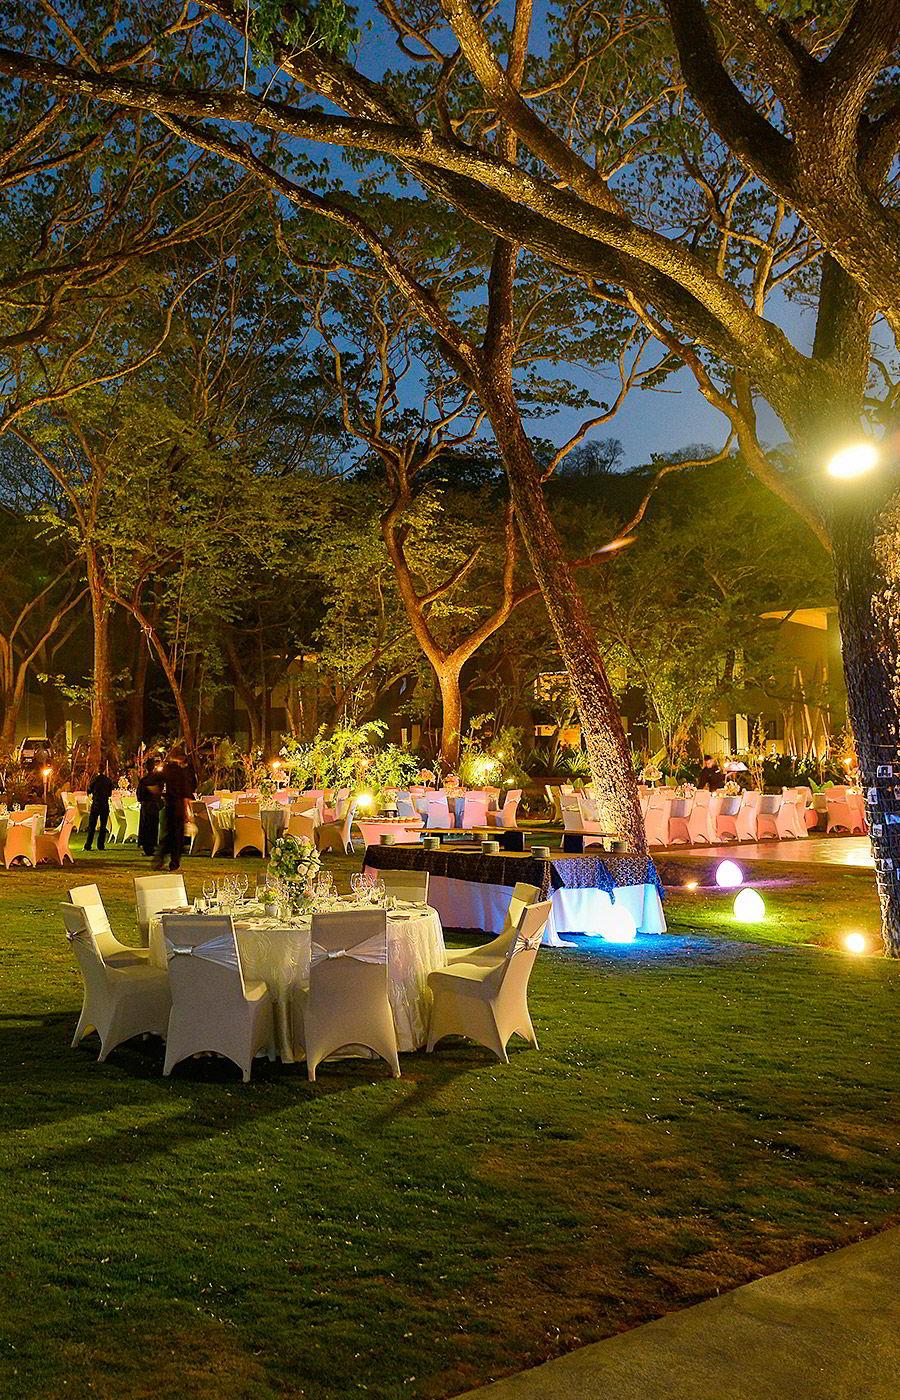 Restaurants Cater Wedding Receptions